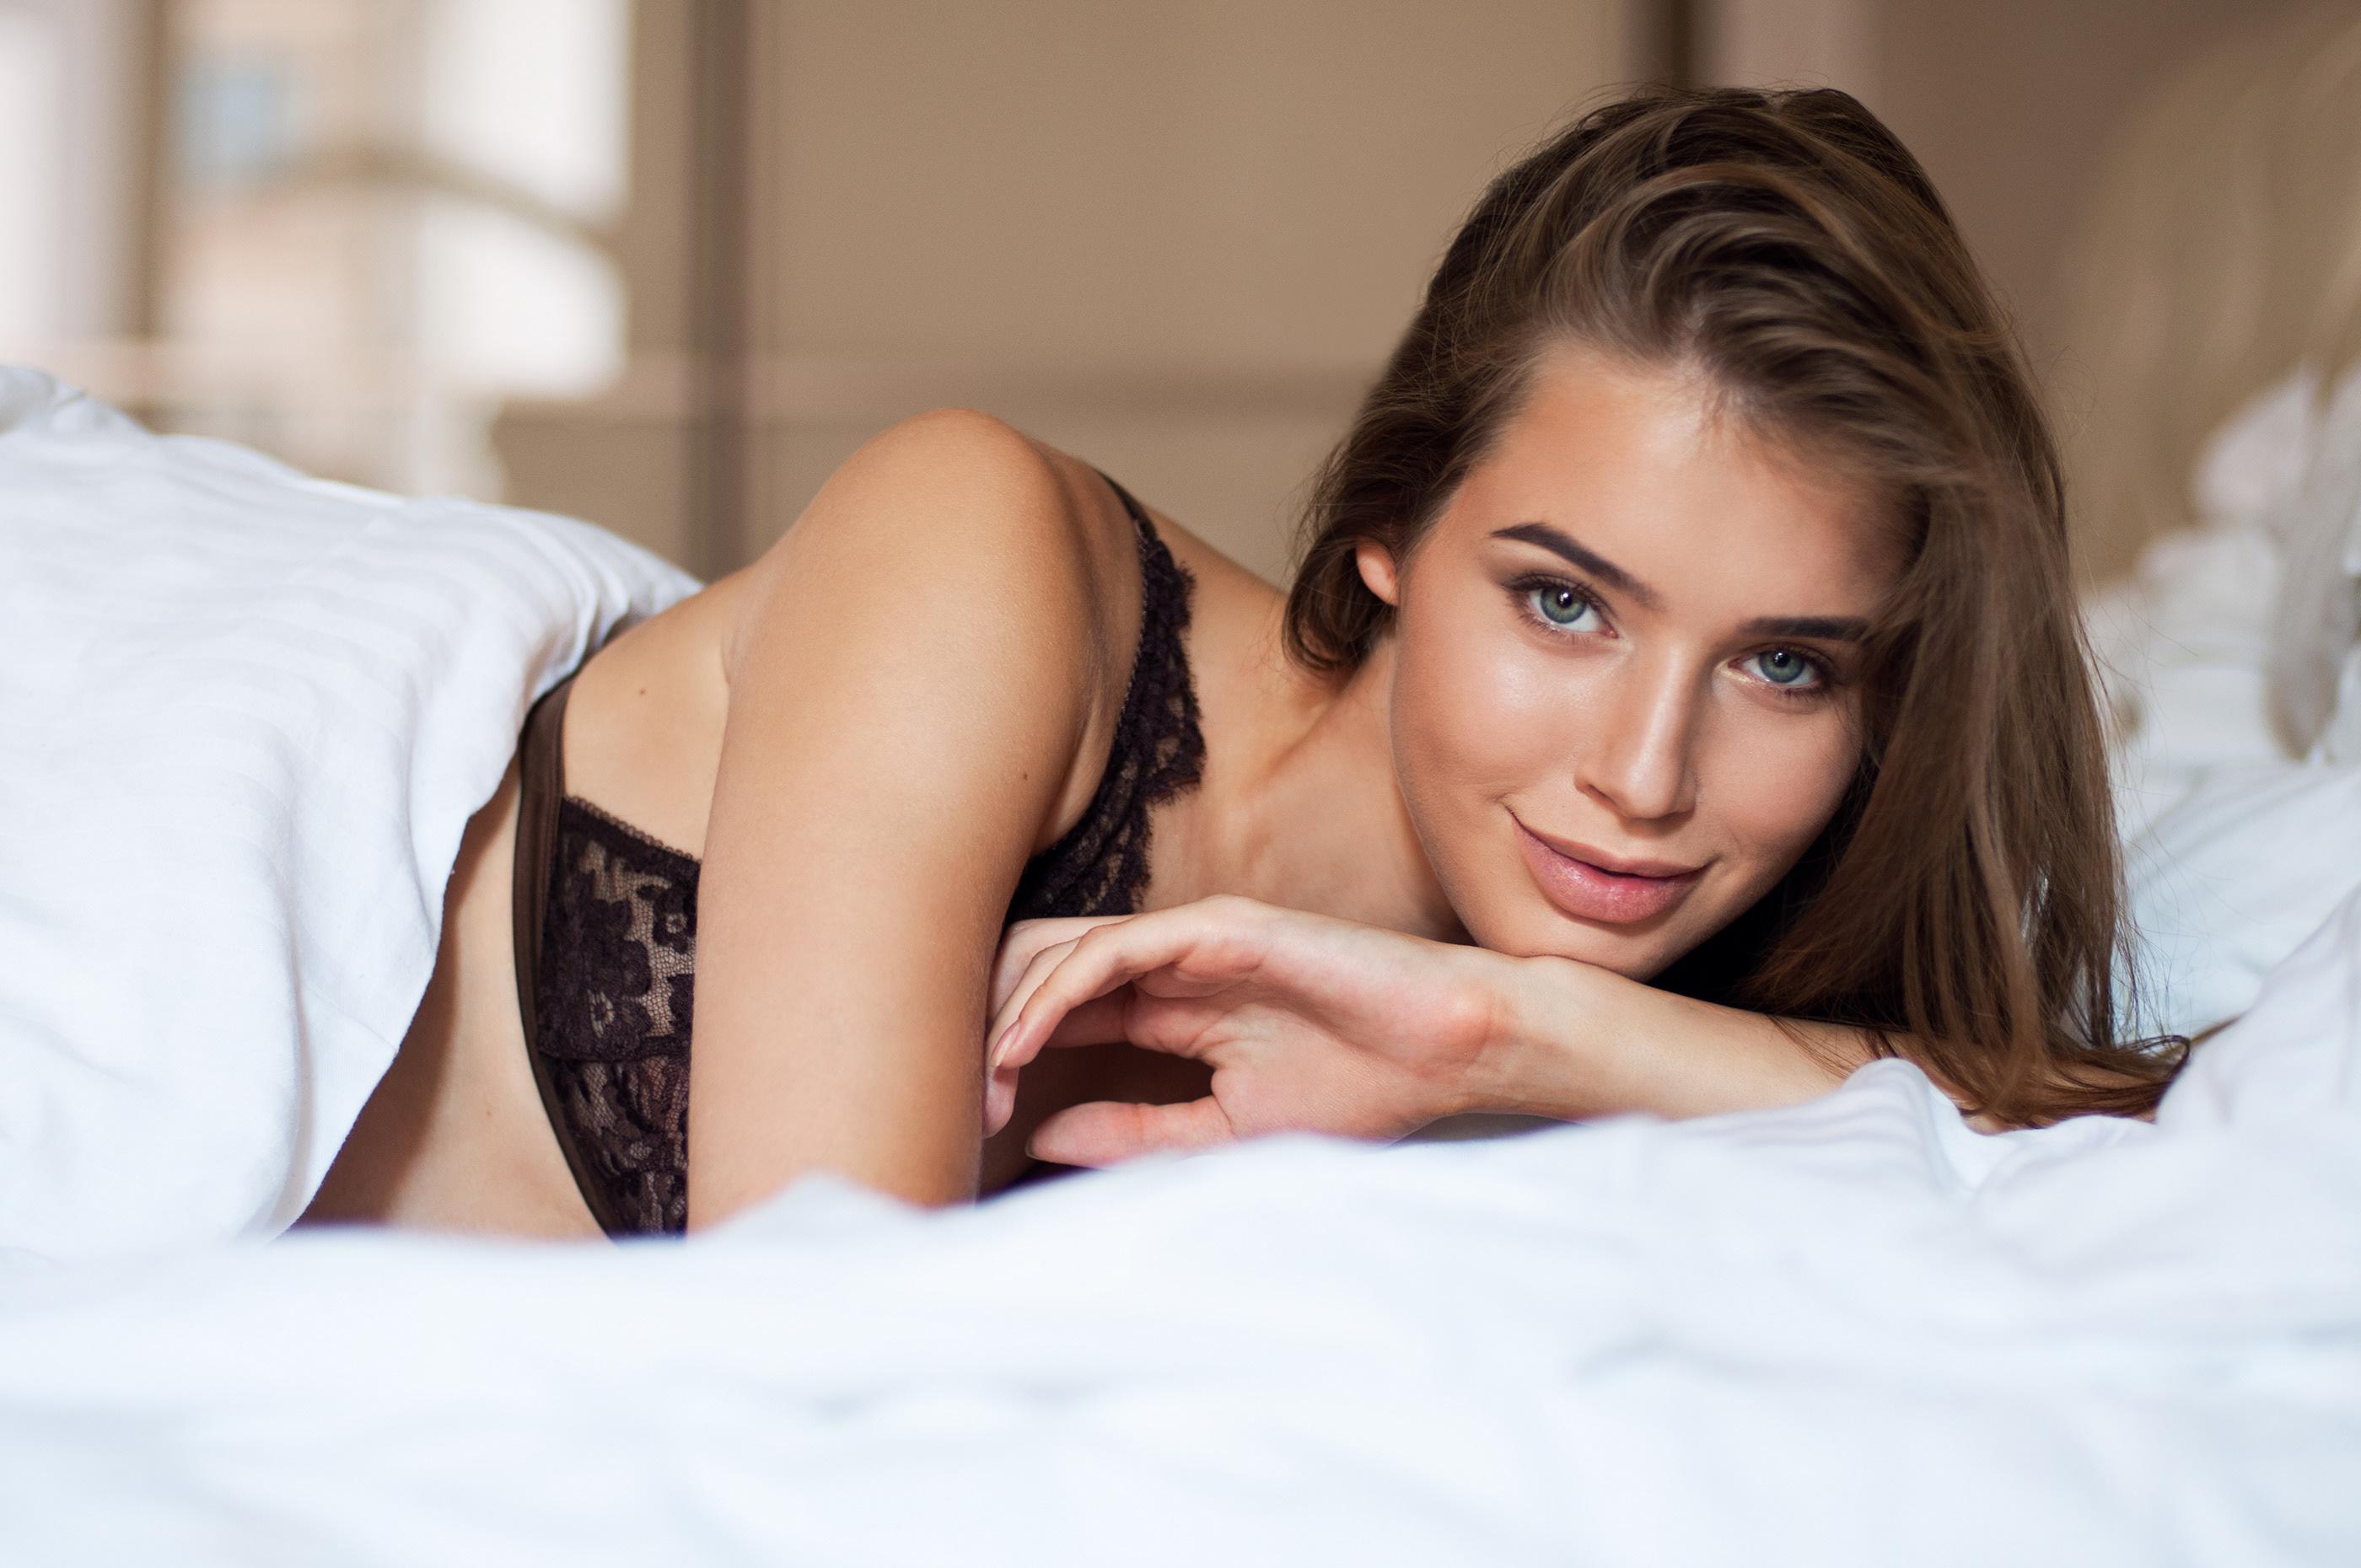 People 2800x1860 Natella women women indoors bed boudoir brunette looking at viewer bare shoulders Anna Boston